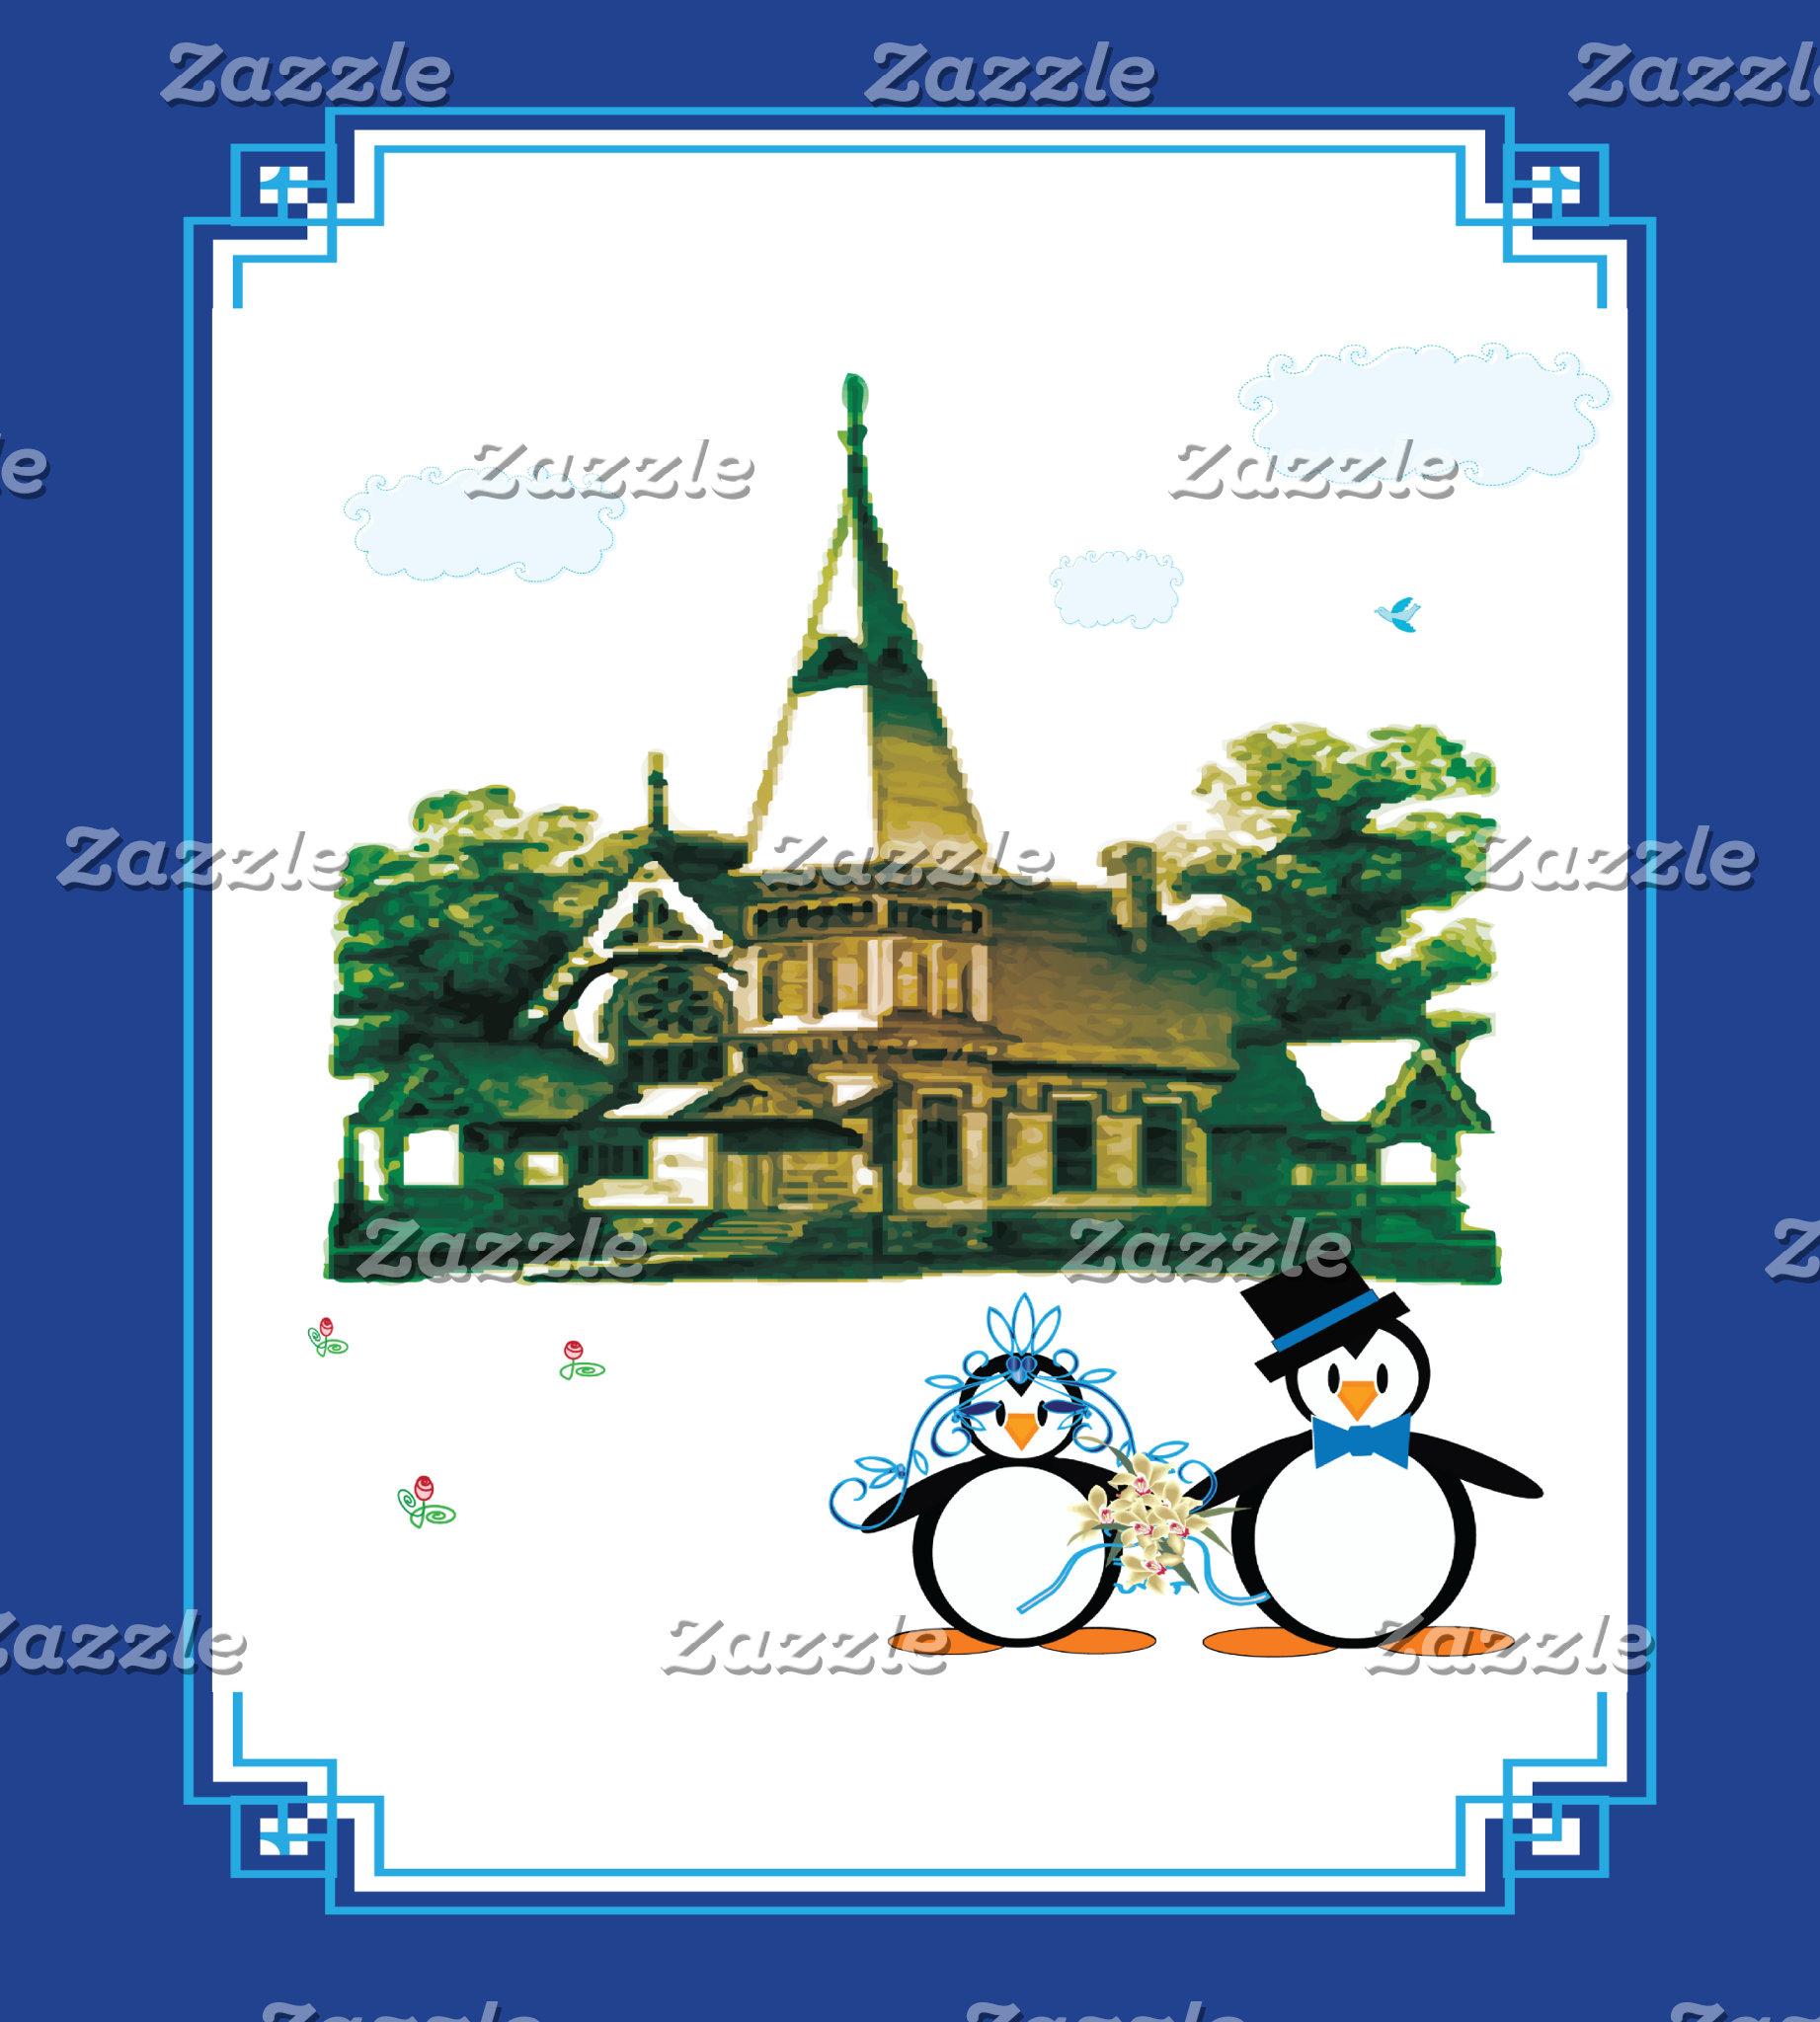 Penguin Weddings